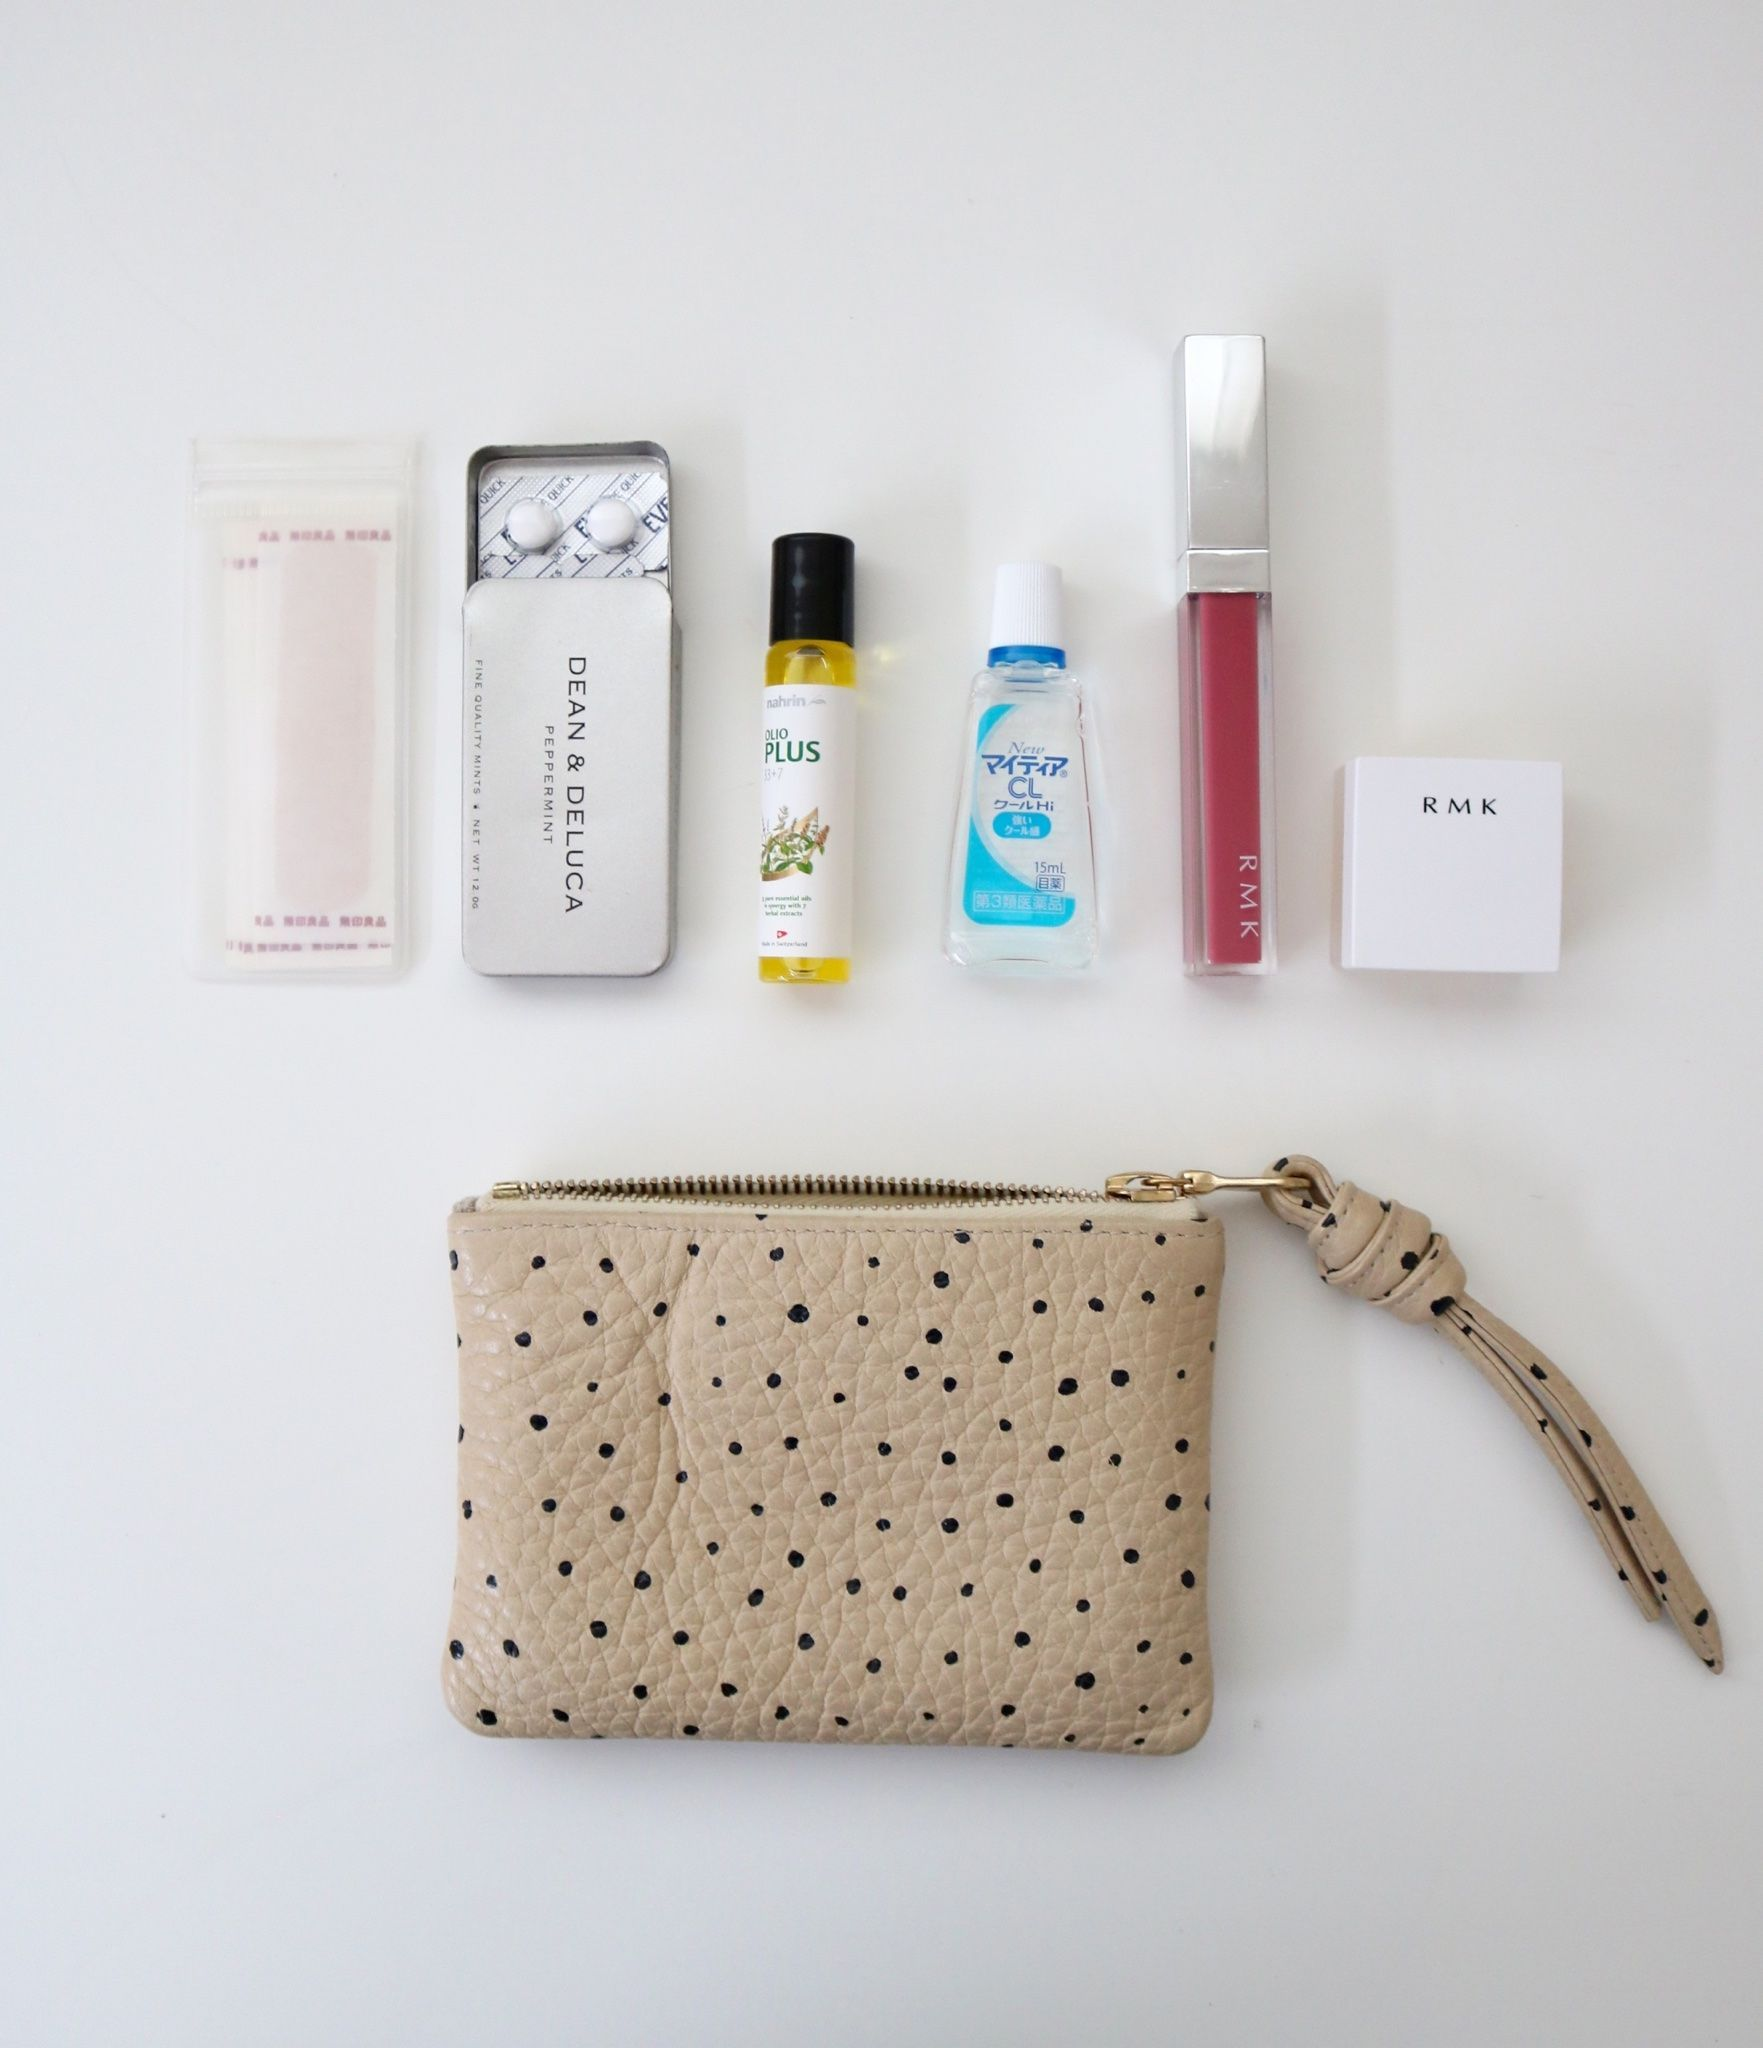 d4a7af7d71dd バッグの中身 × bag in bag ☆ | Ducks Home - 楽天ブログ | 収納の達人 ...